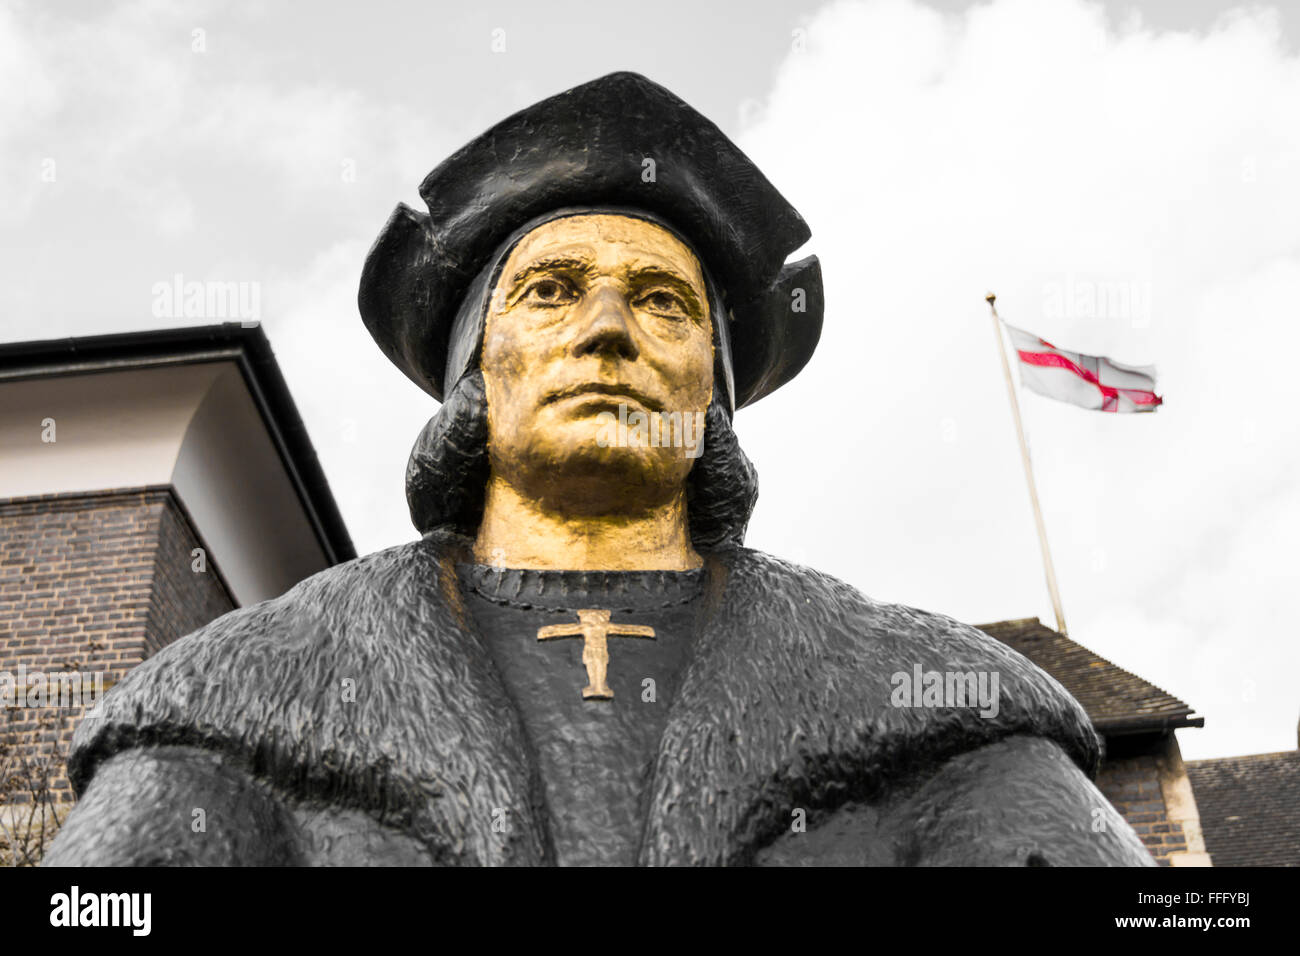 Sir Thomas Moore Statue, Cheyne Walk, Chelsea, Royal Borough of Kensington and Chelsea, London, England, United - Stock Image